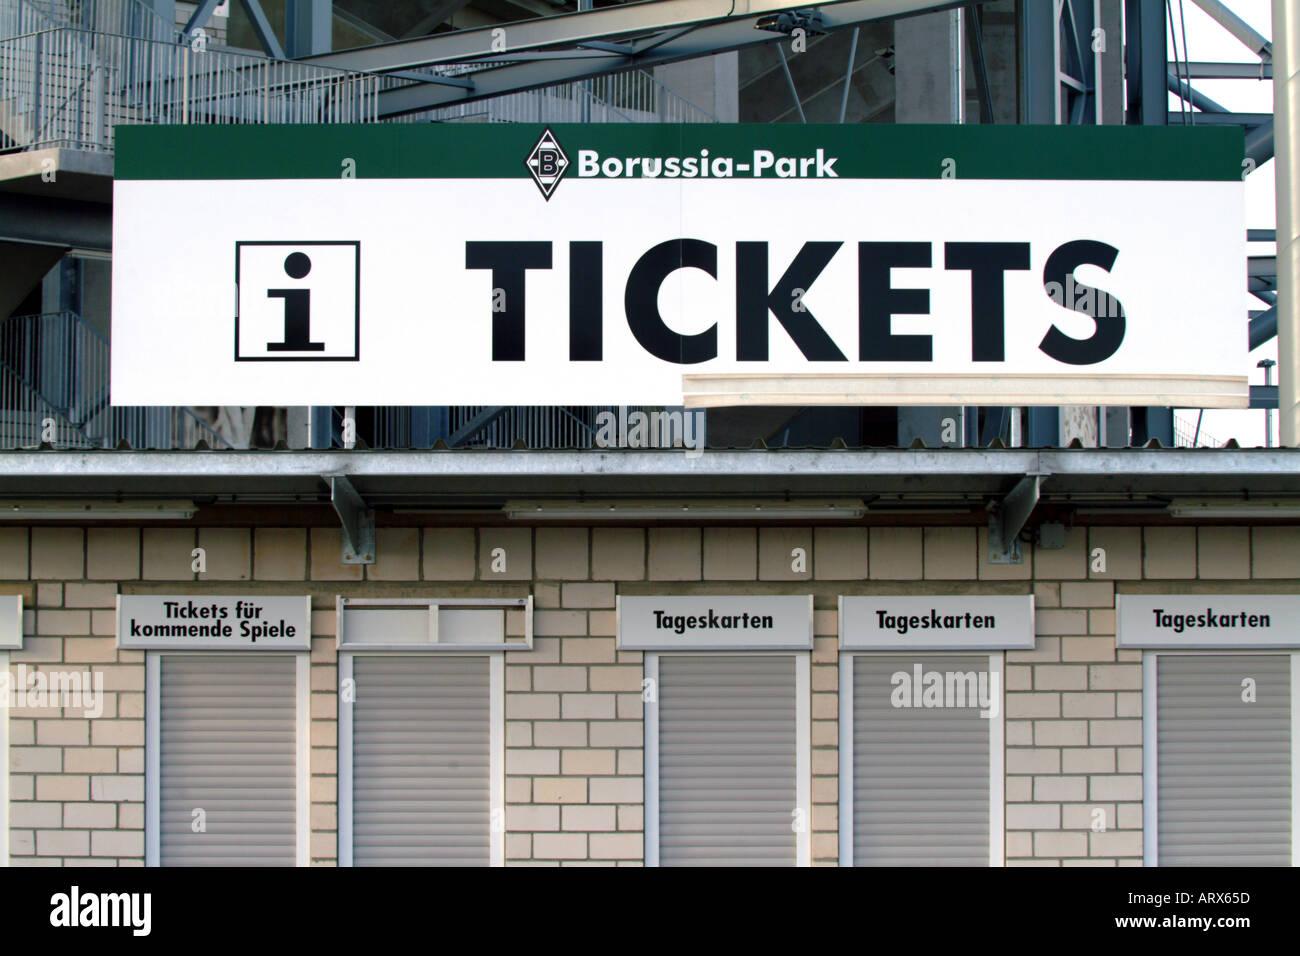 tickets Borussia Mönchengladbach - Stock Image